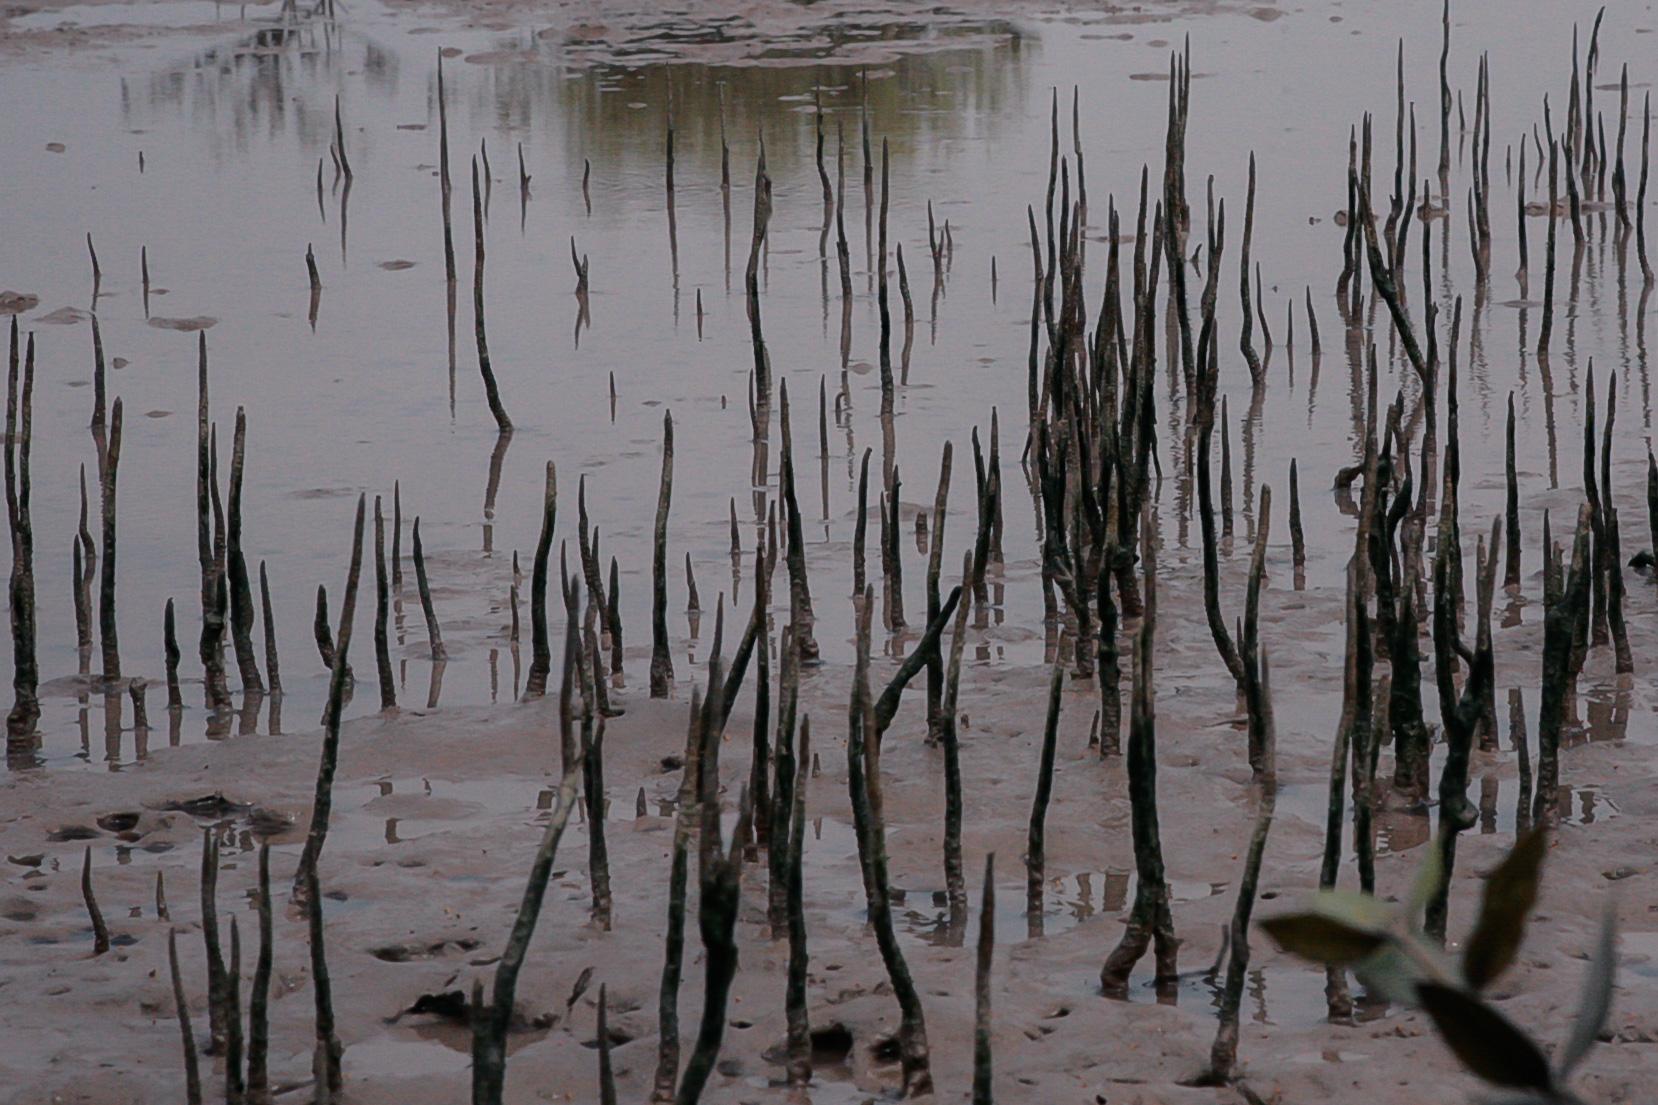 2012-13-mangrove-plantations-binqasim.jpg